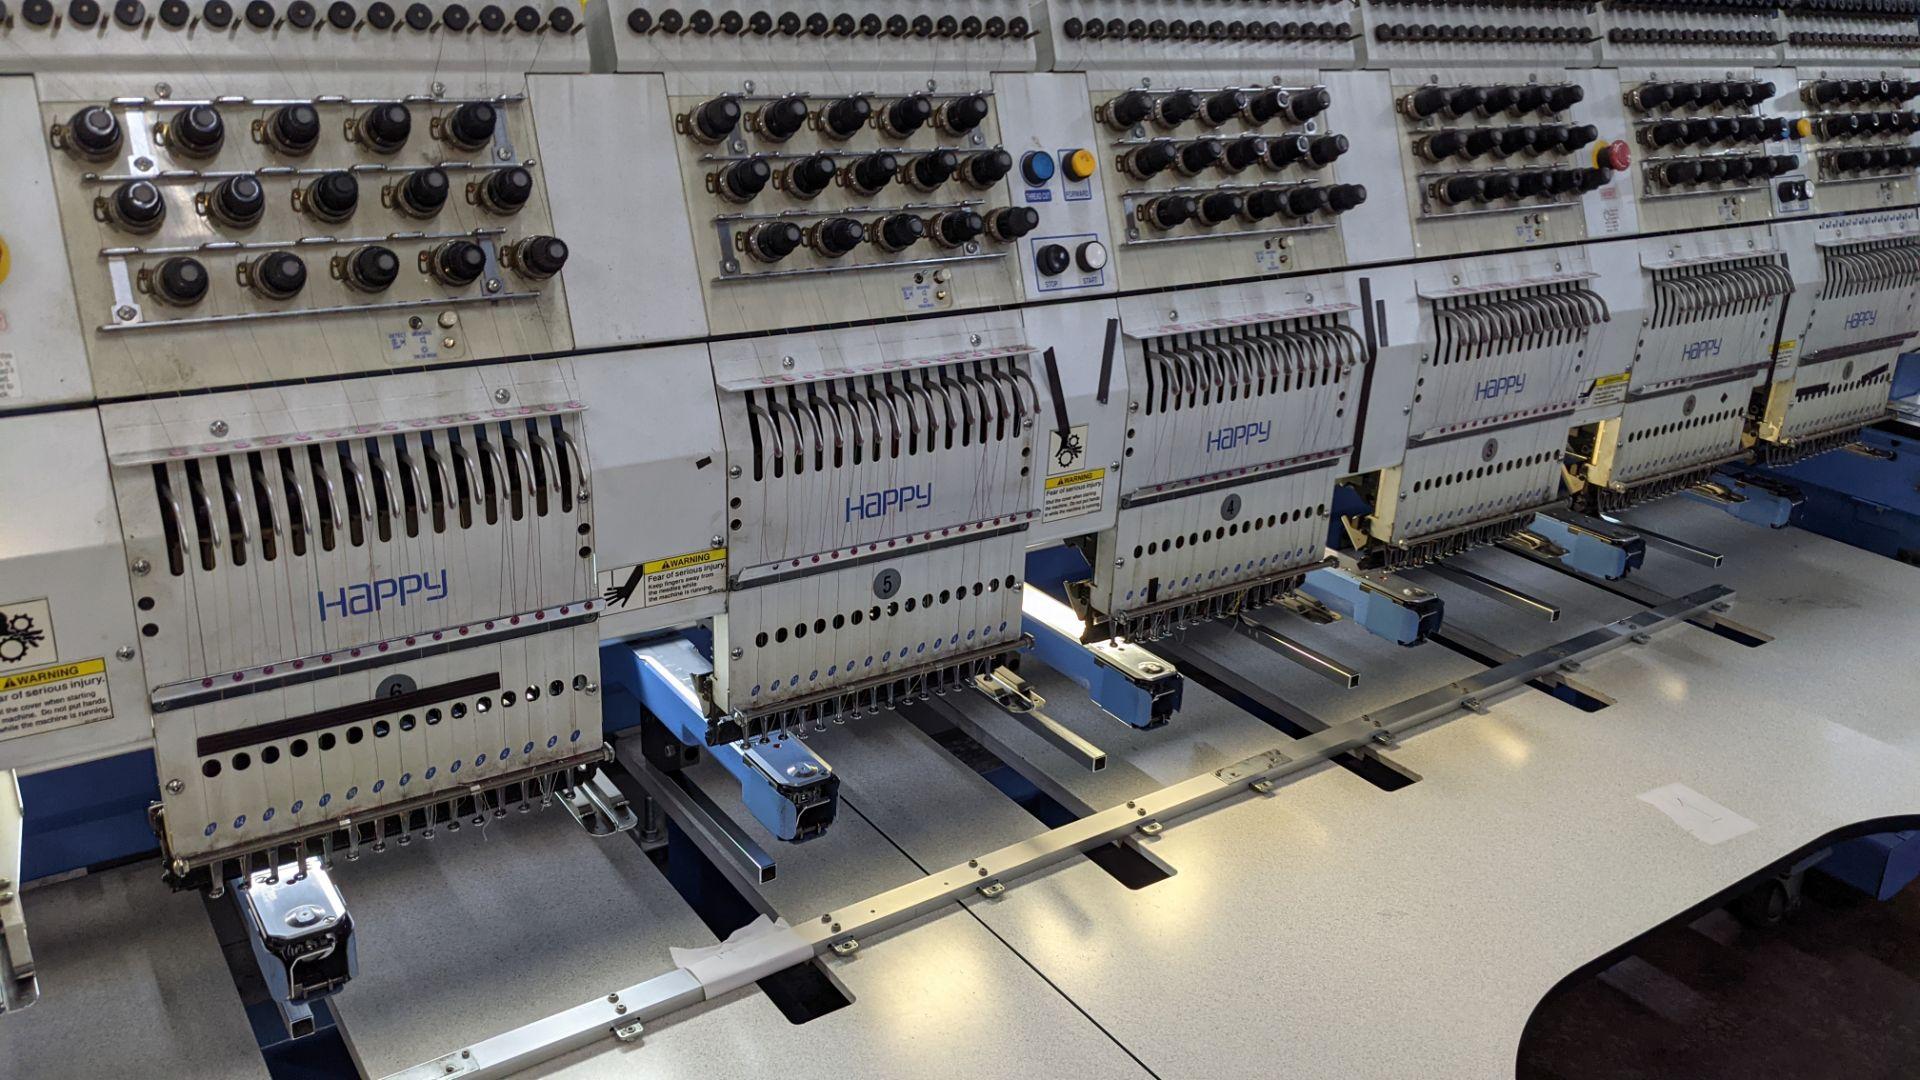 Happy 8 head embroidery machine, model HCG-1508B-45TTC, 15 needles per head, including frames & othe - Image 8 of 32